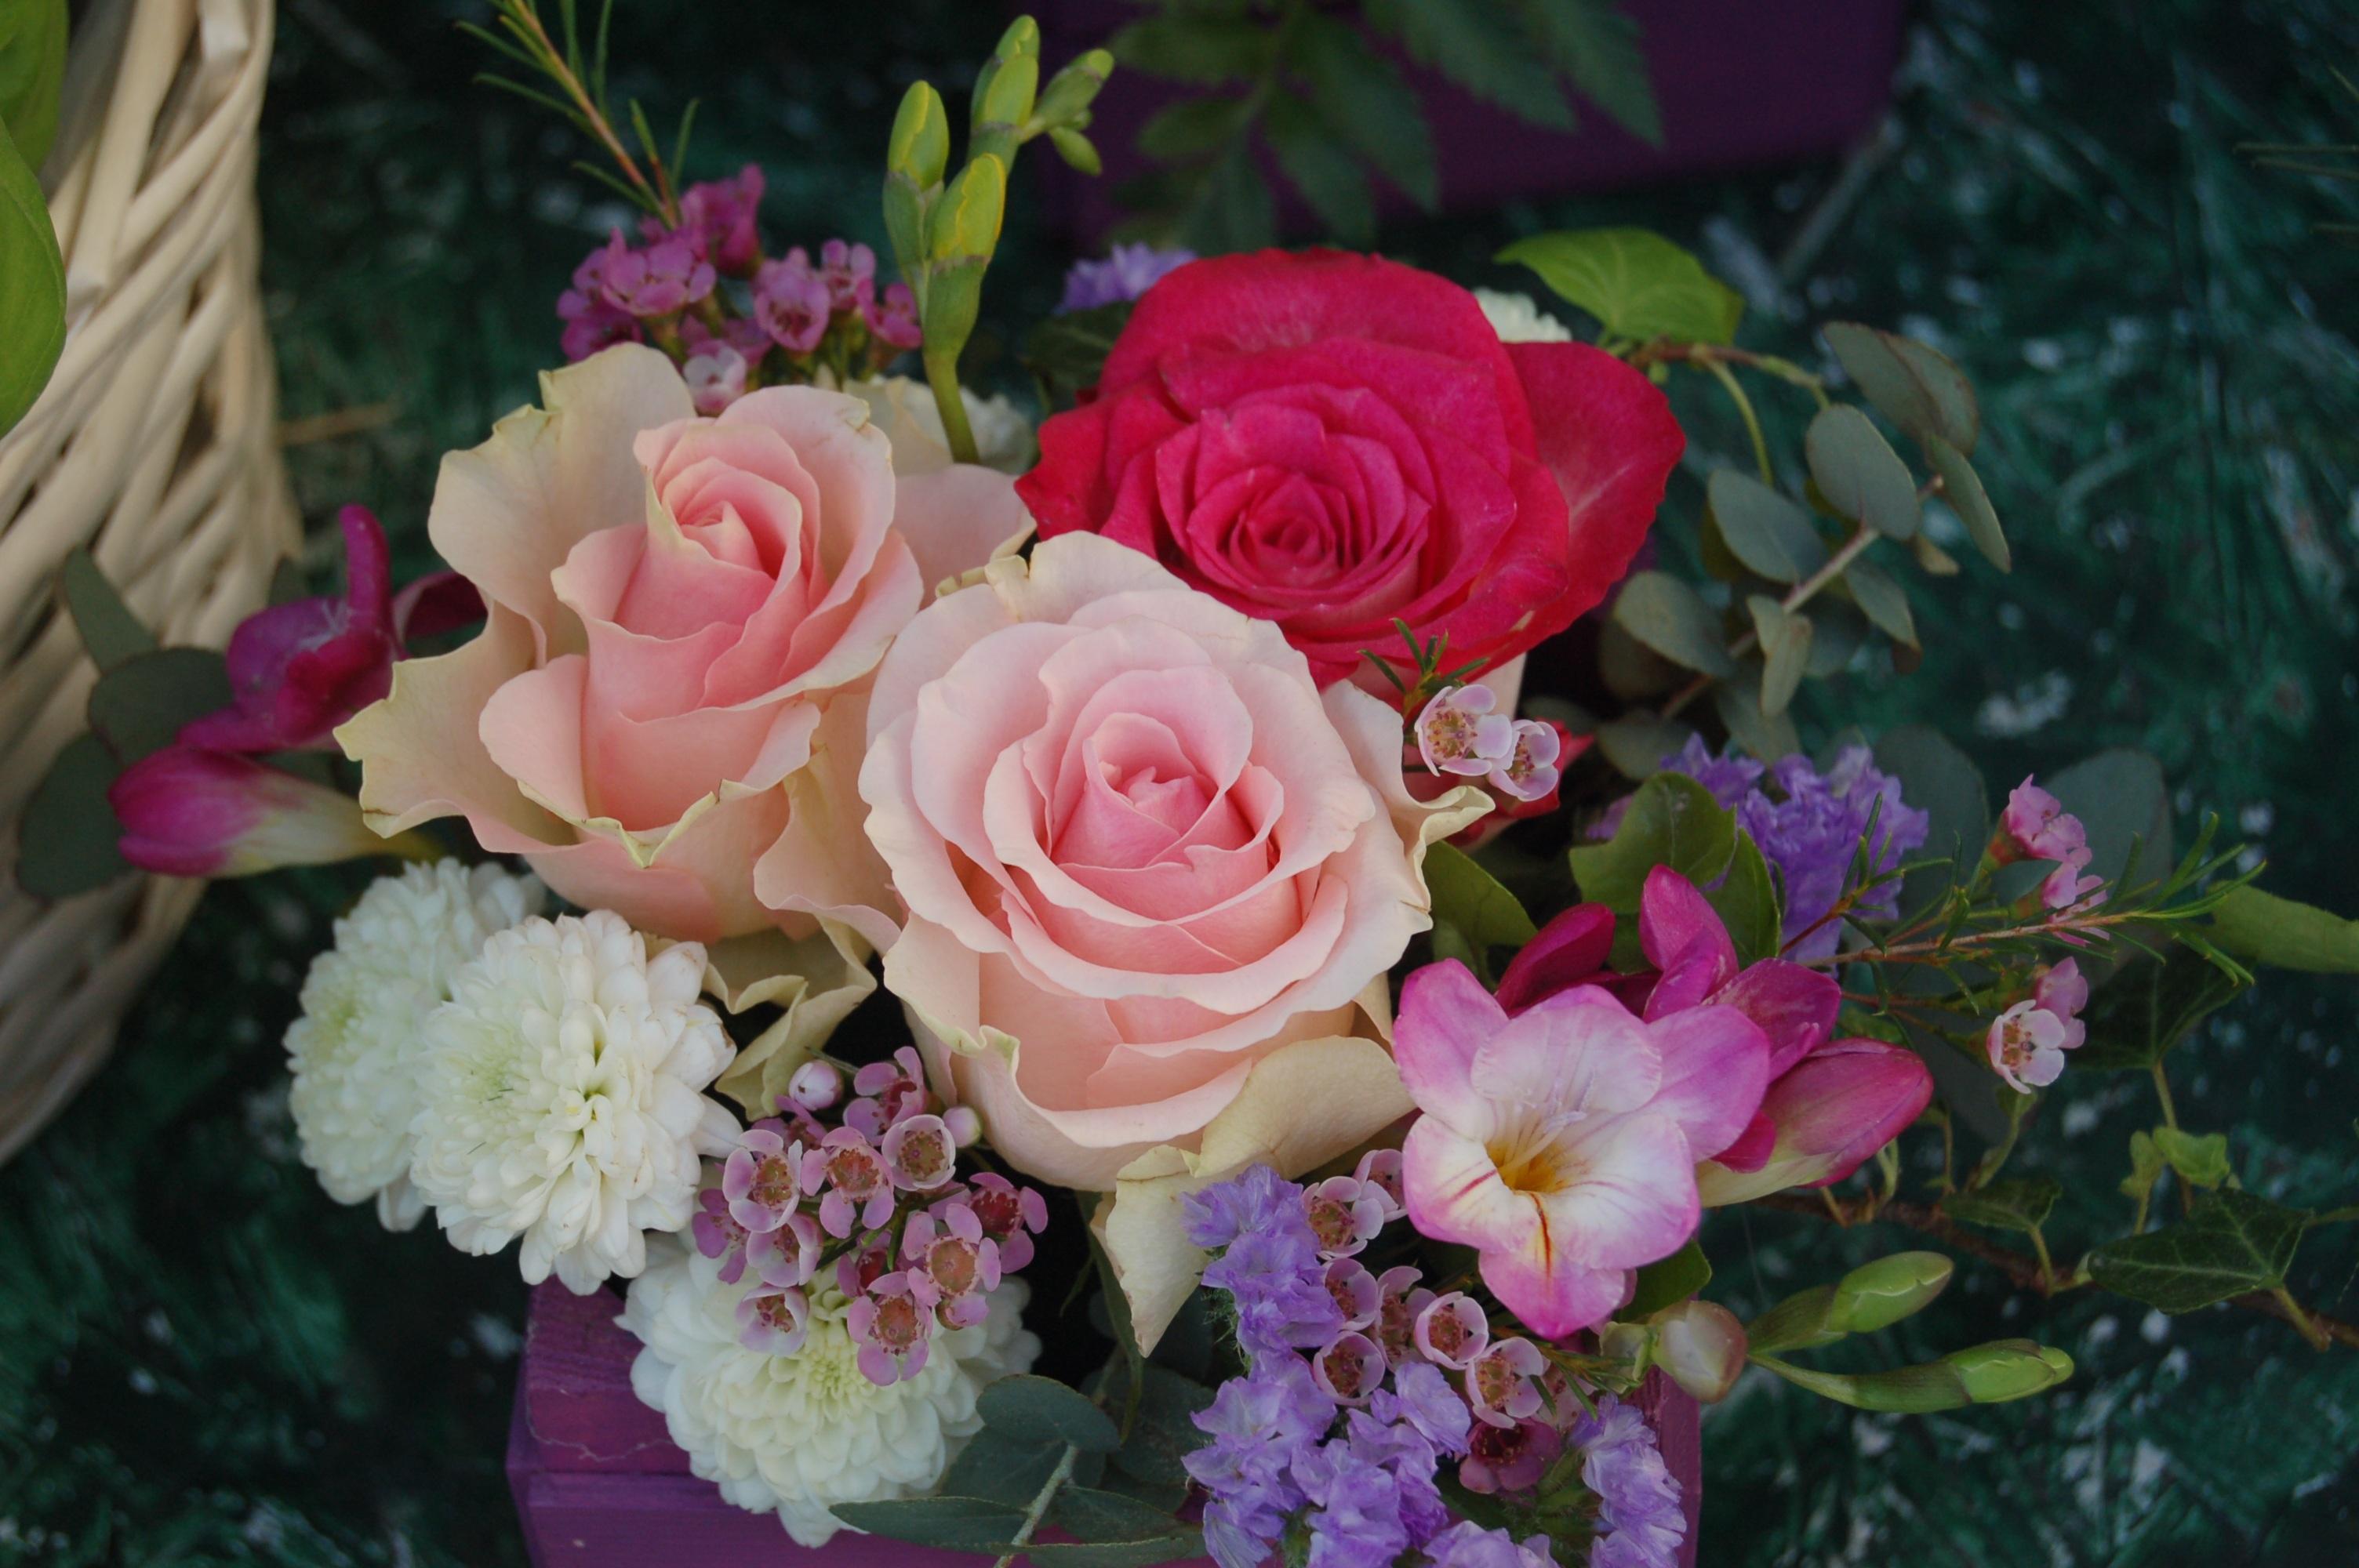 بالصور صور اجمل ورد , اجمل صور لبوكيهات الورد 3493 5